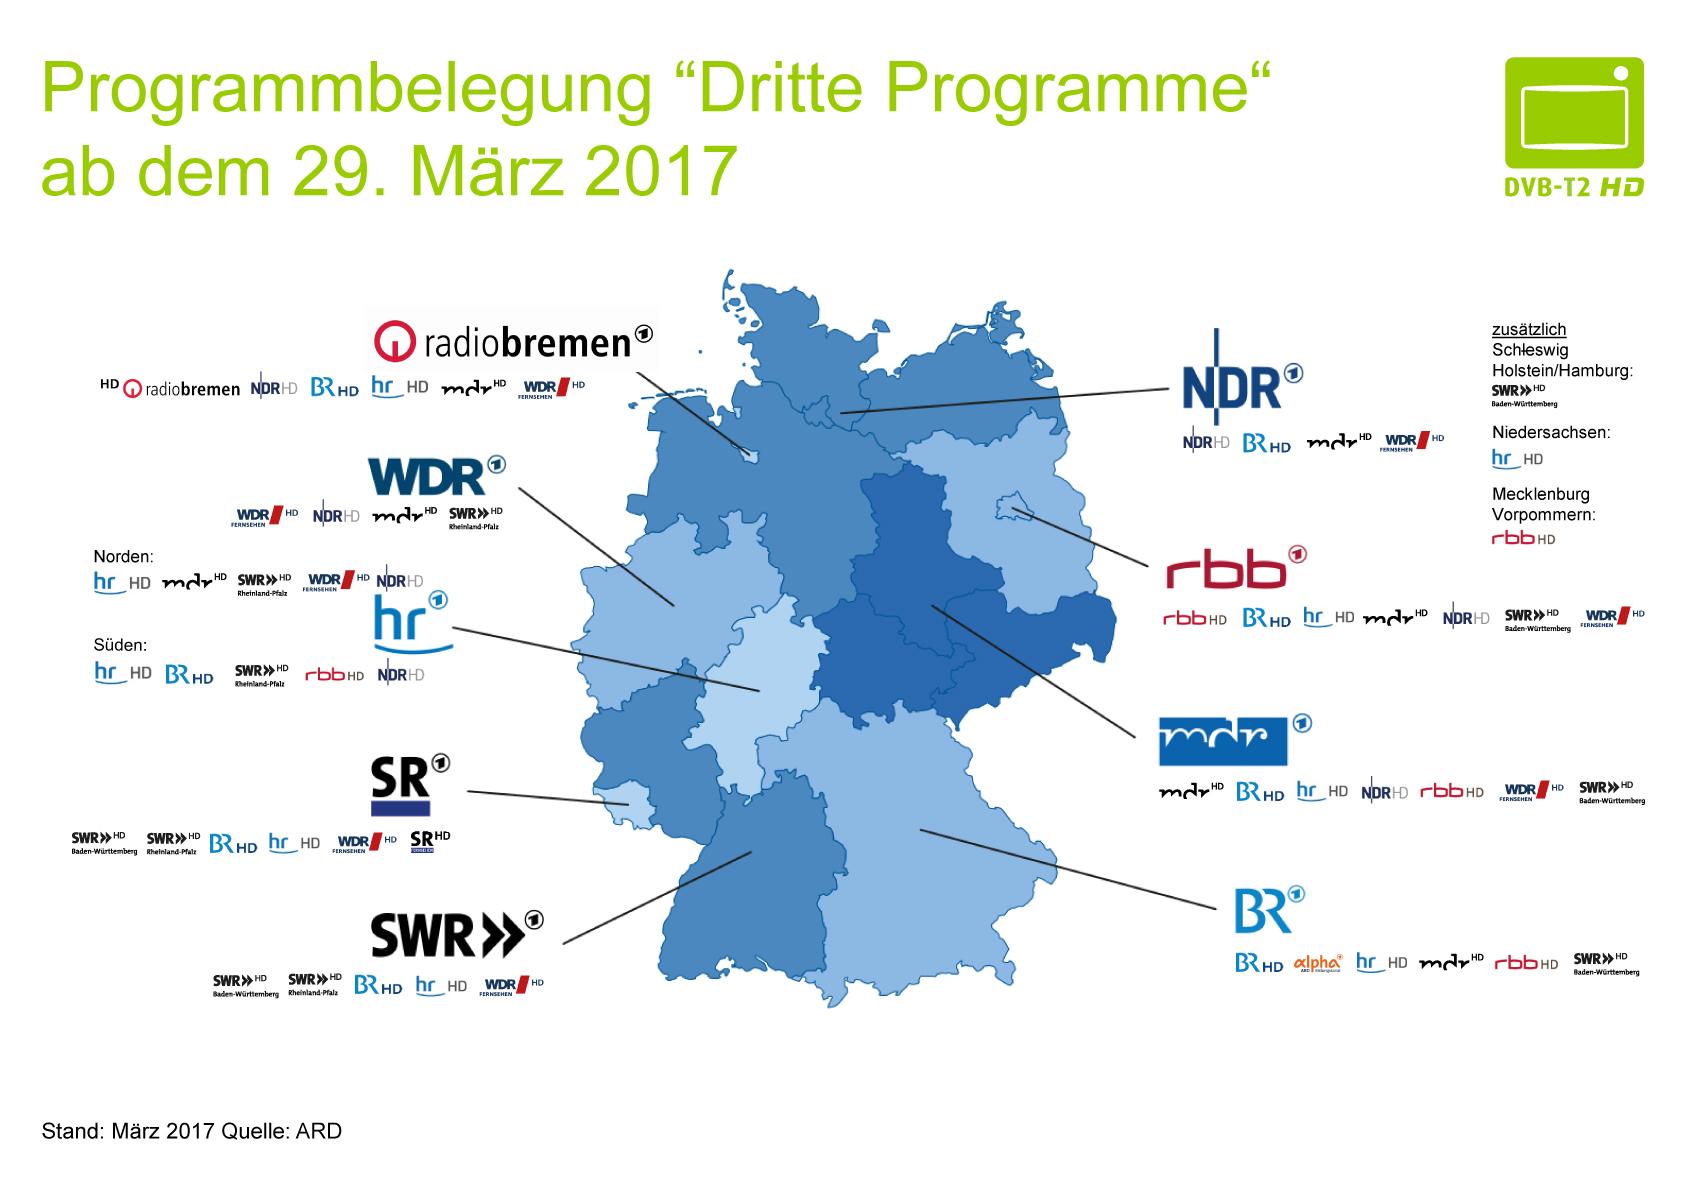 dbb data oranienburg